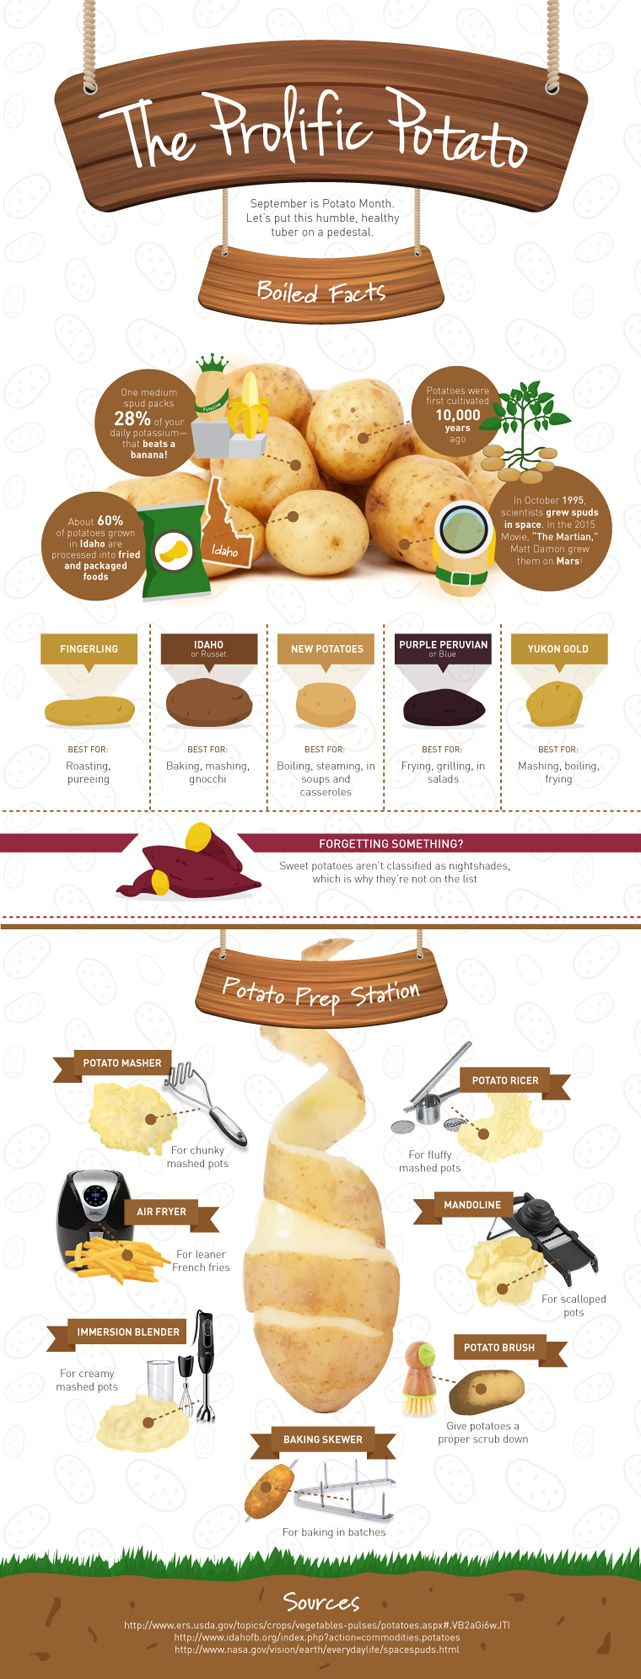 The Prolific Potato Infographic Food Potatoes Recipes